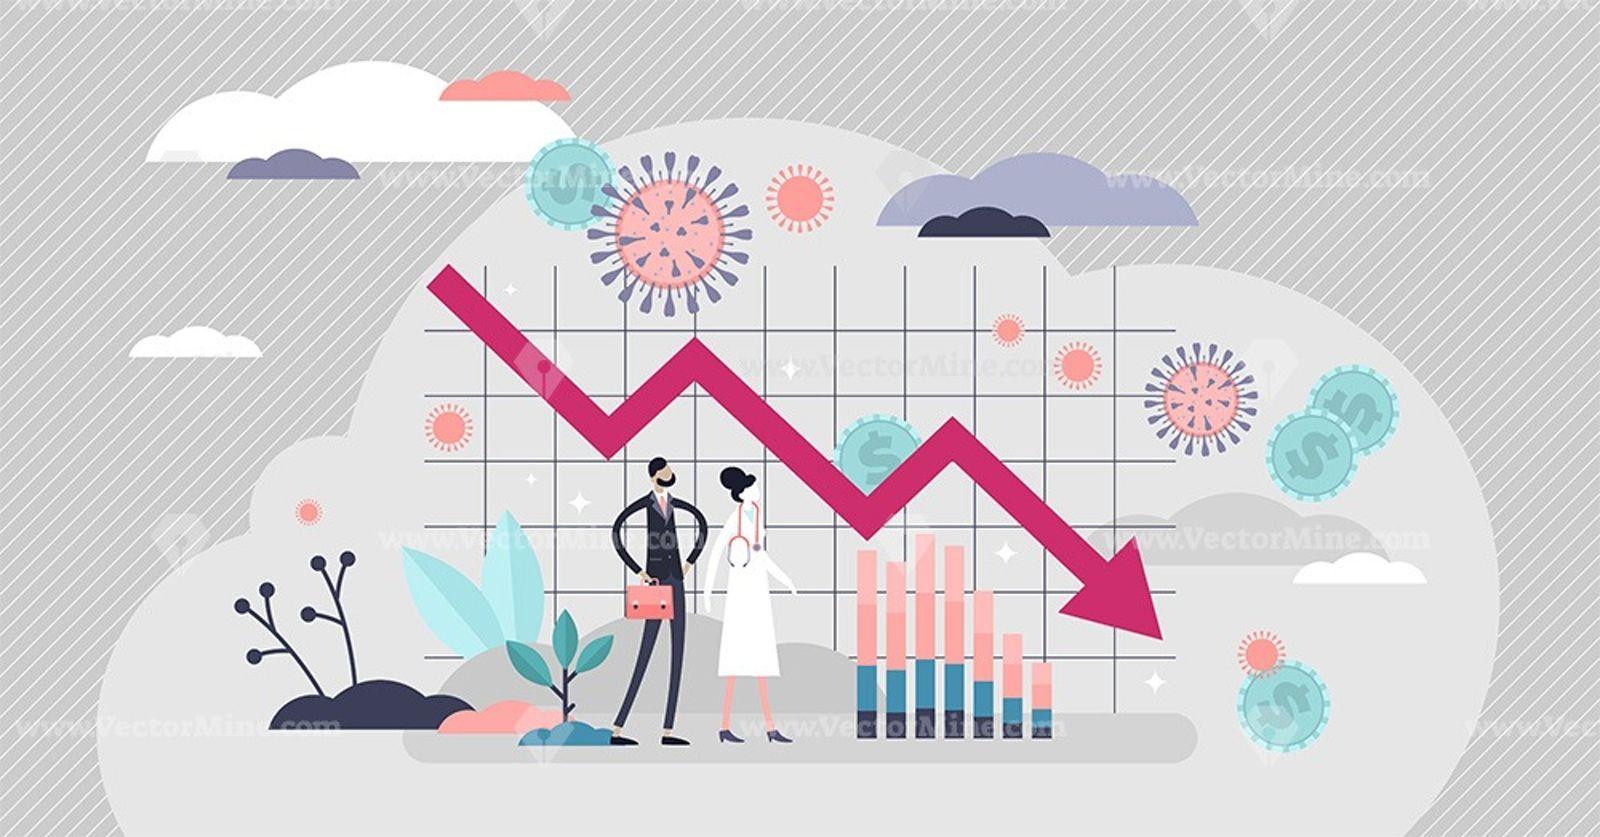 Economic crisis vector illustration in 2020 vector